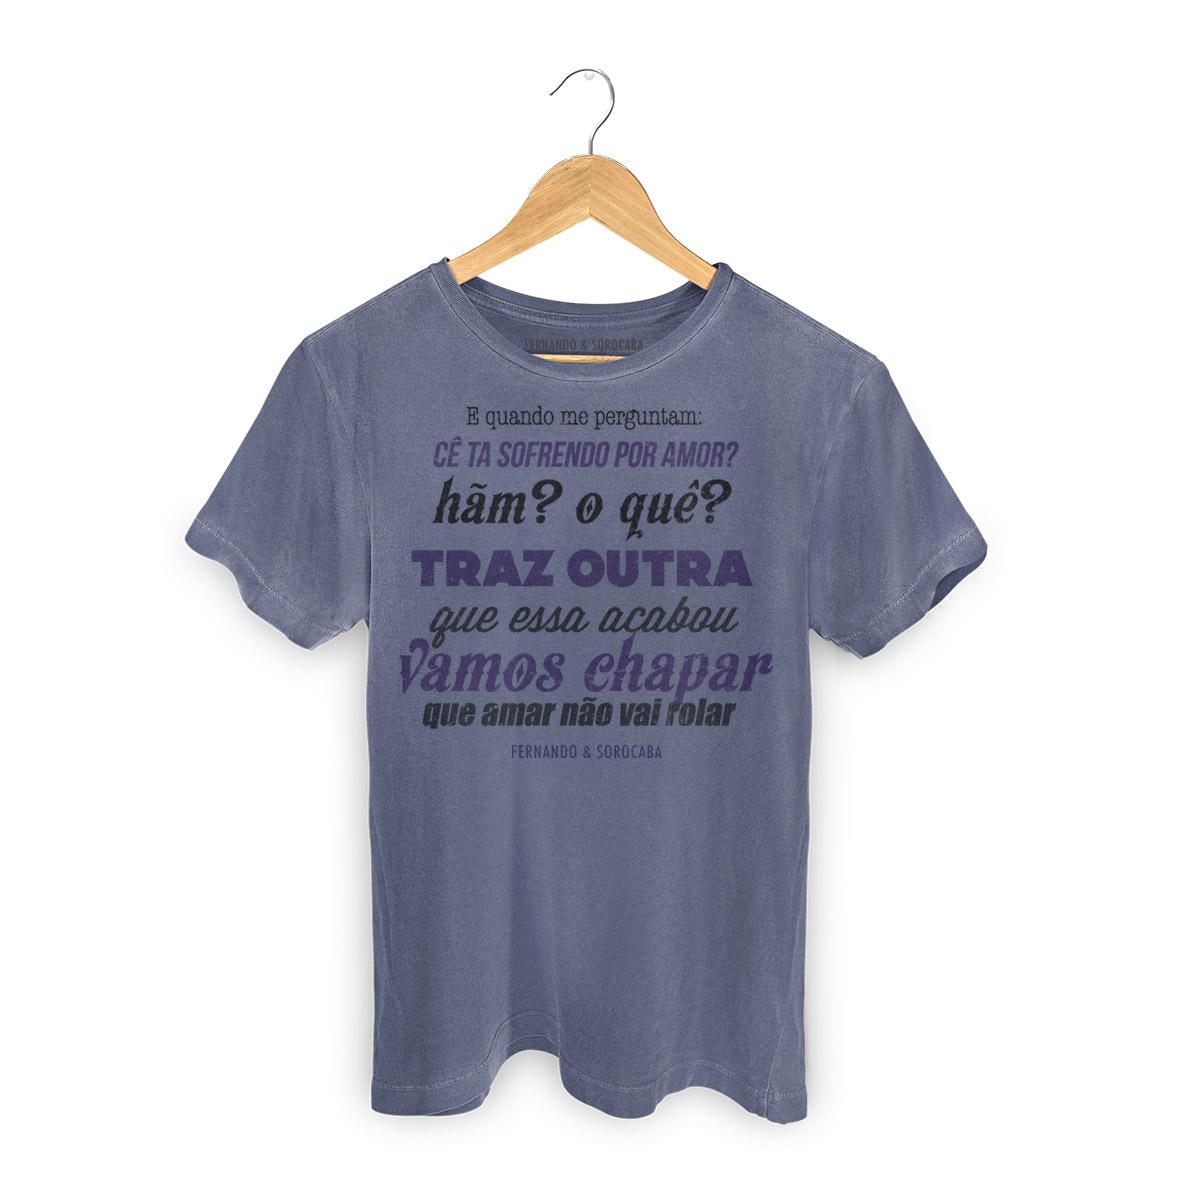 T-shirt Premium Masculina Fernando & Sorocaba Vamos Chapar